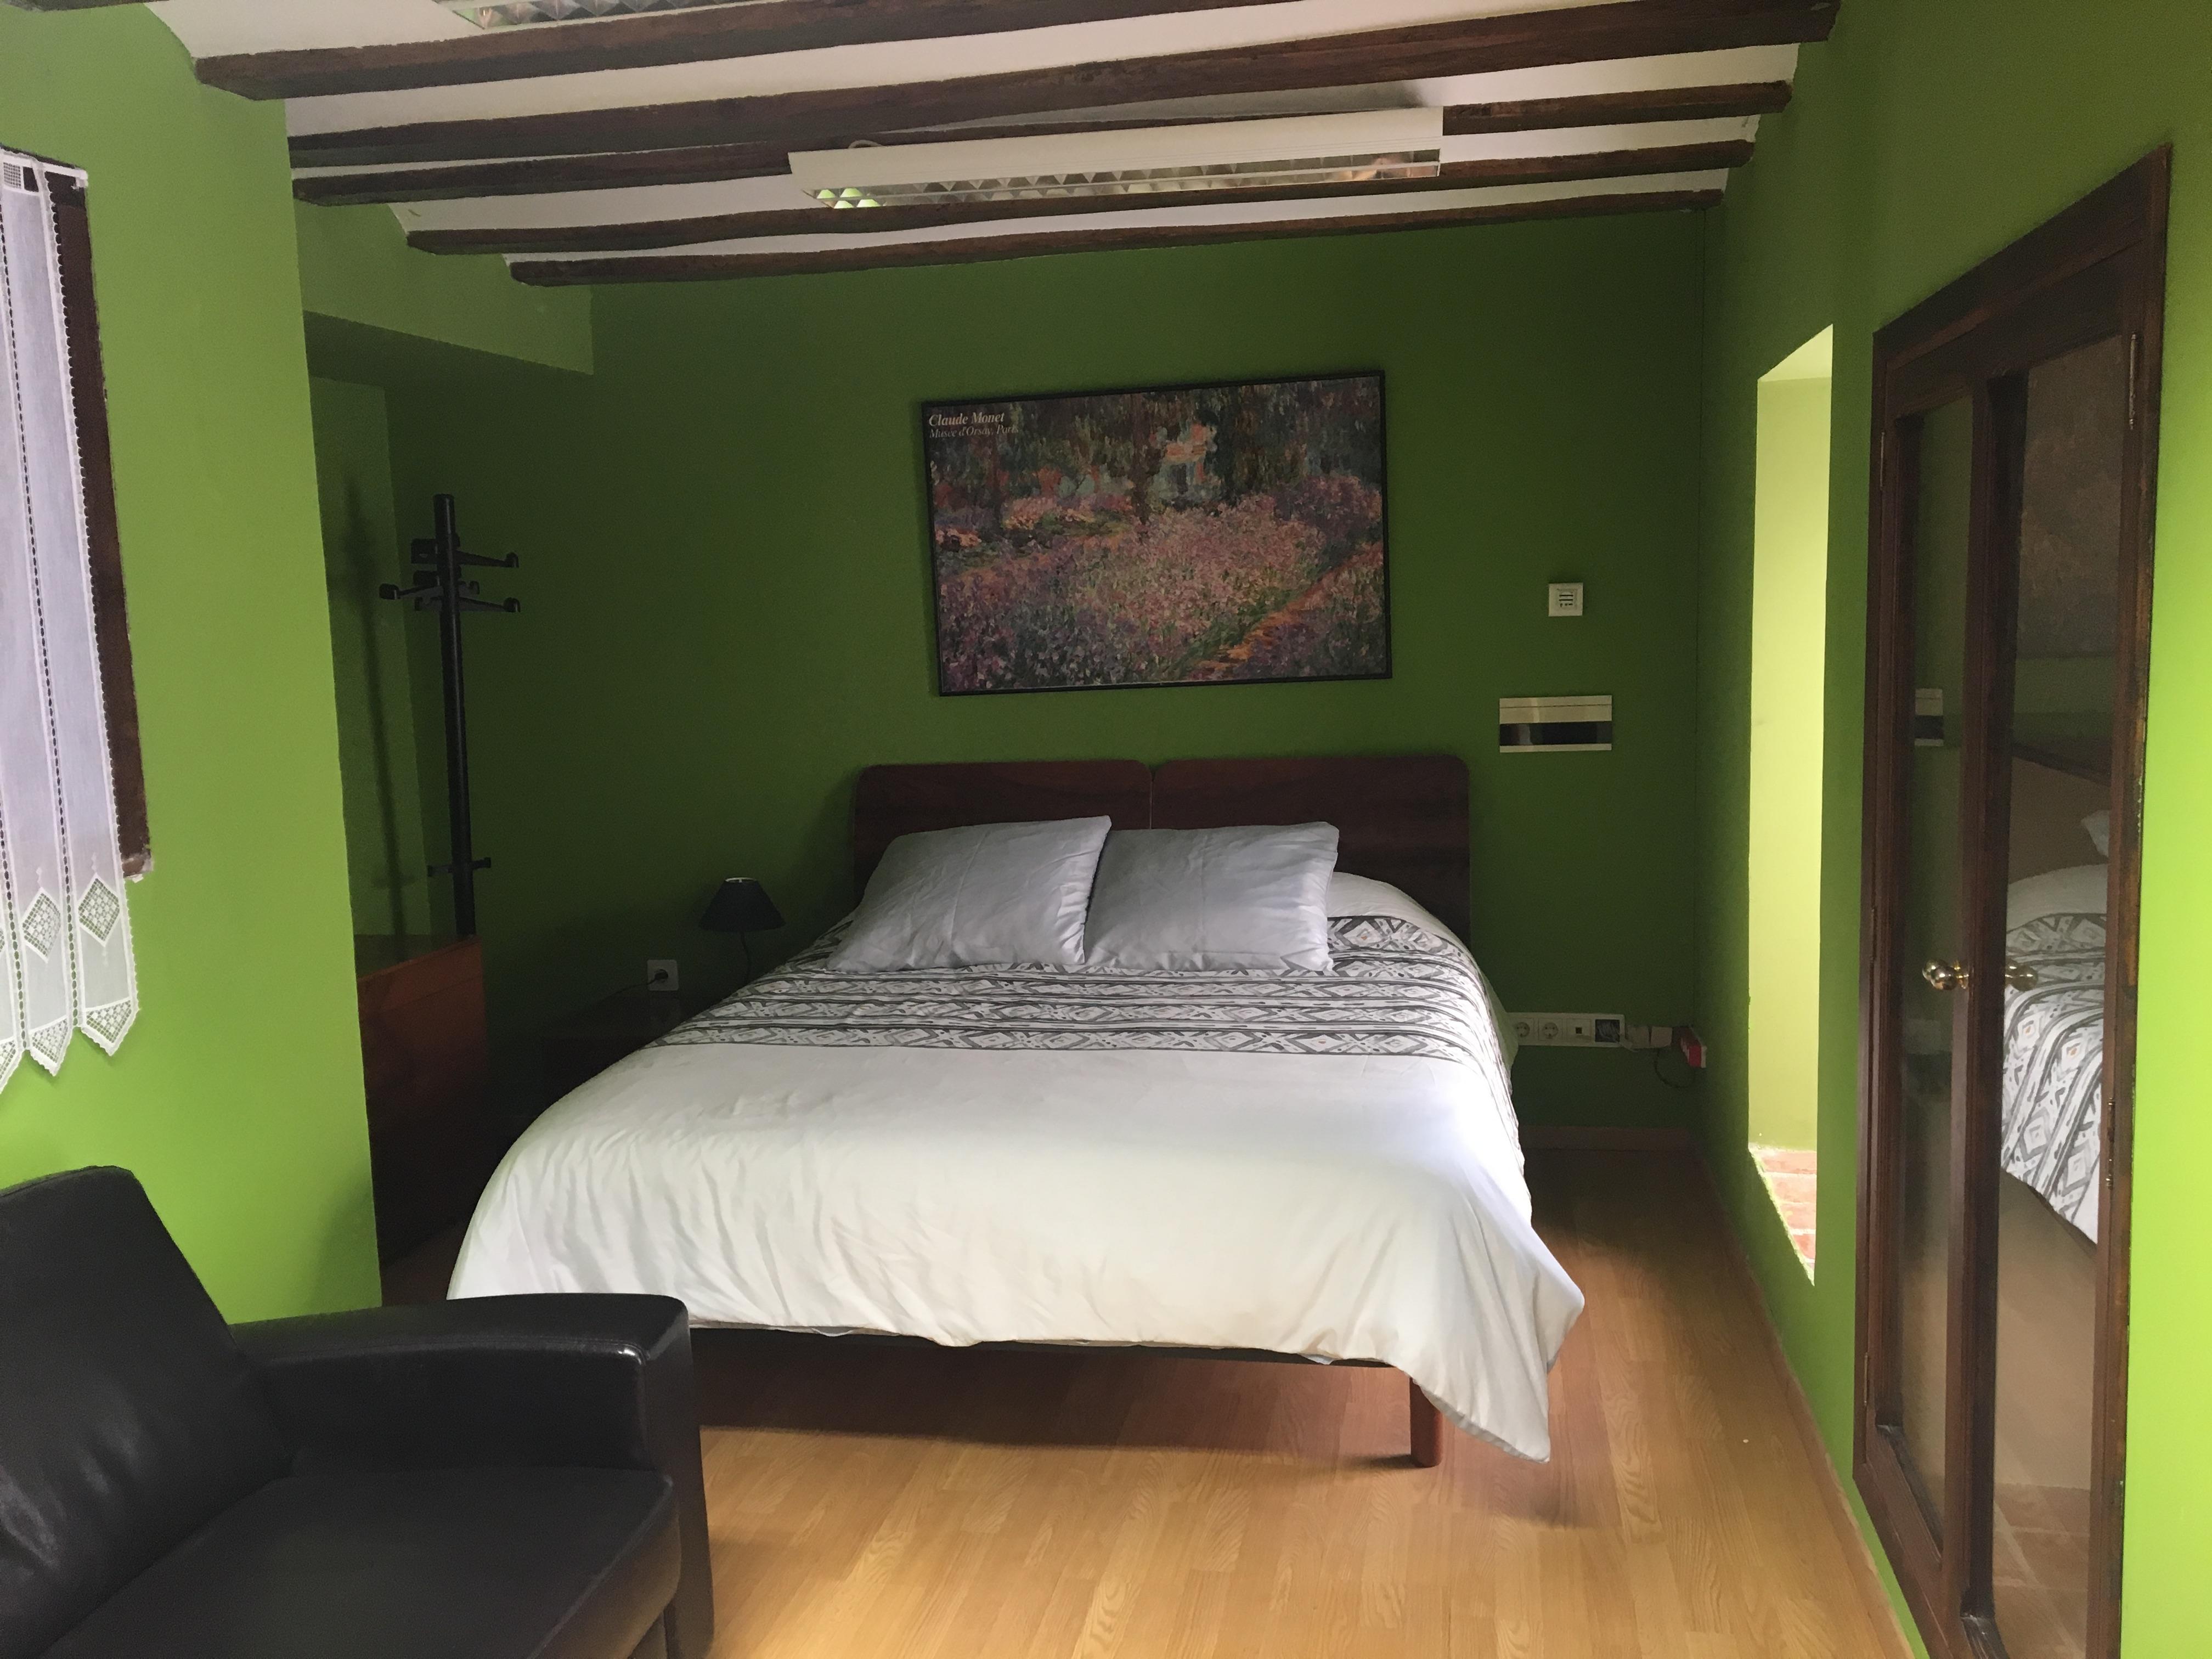 Ferienhaus Casa Rural Lasai Haus (2684718), Biasteri, Alava, Baskenland, Spanien, Bild 7